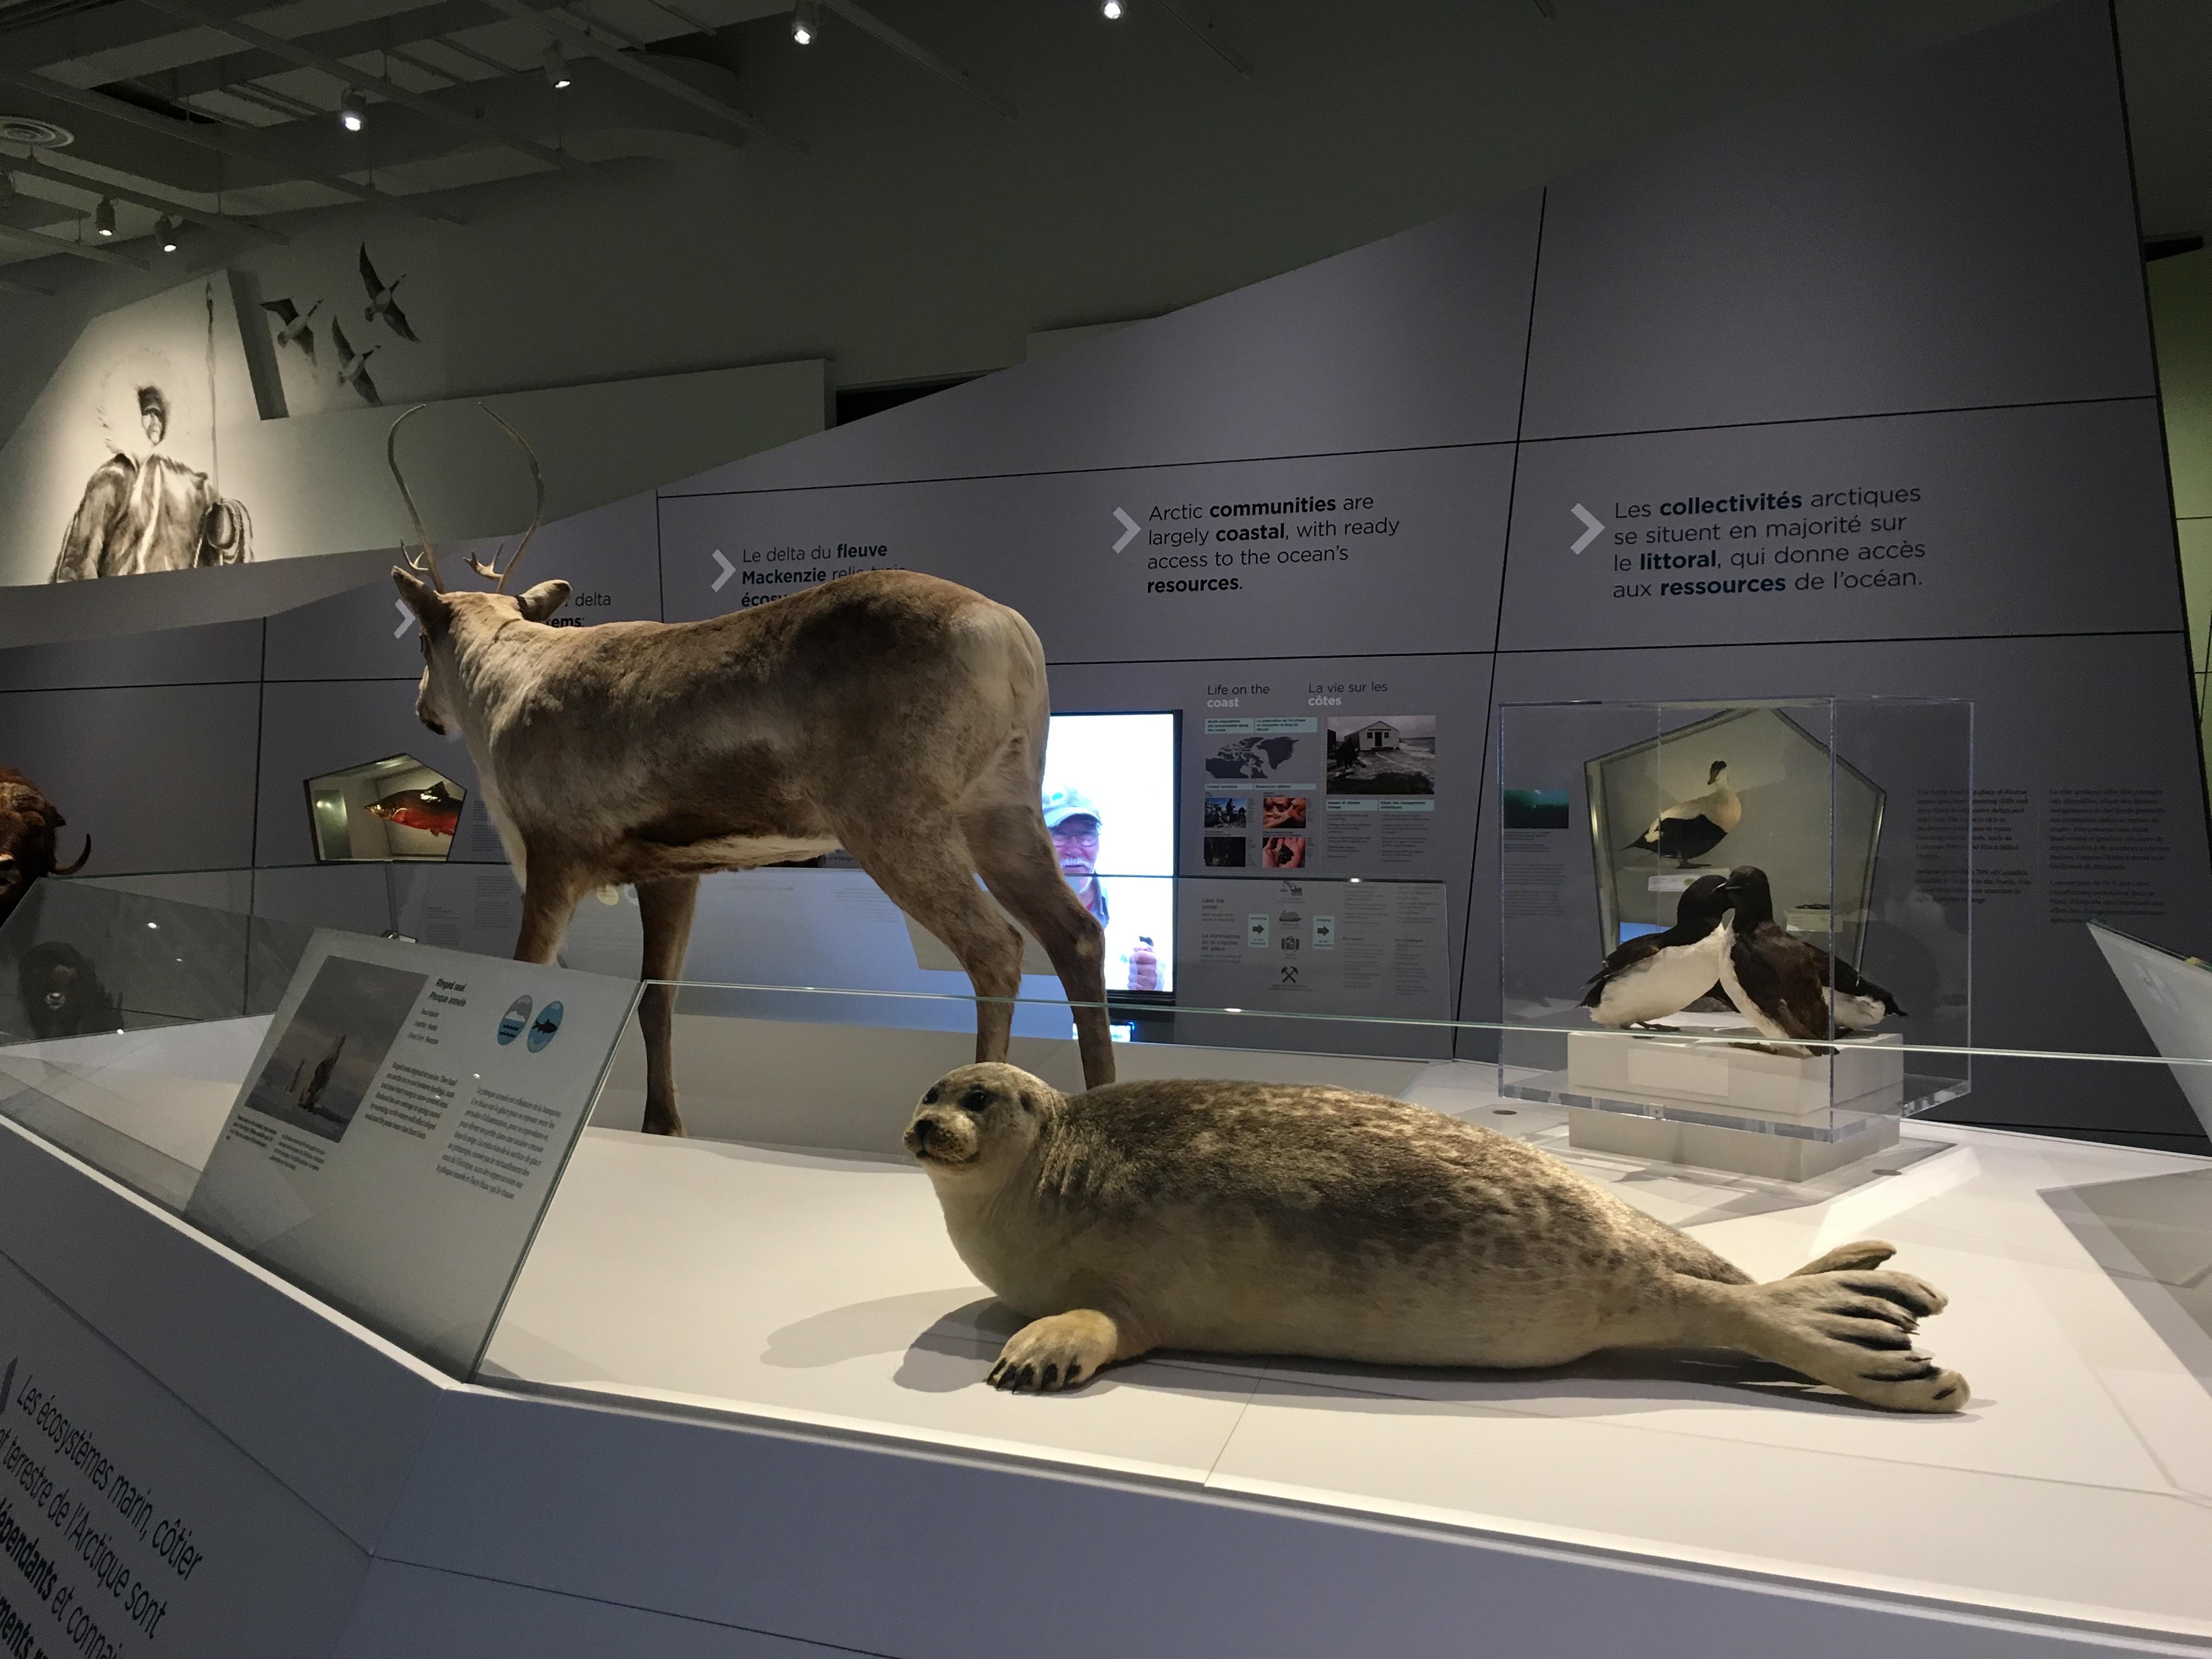 Los mejores museos de historia natural del mundo canadian museum of nature ottawa